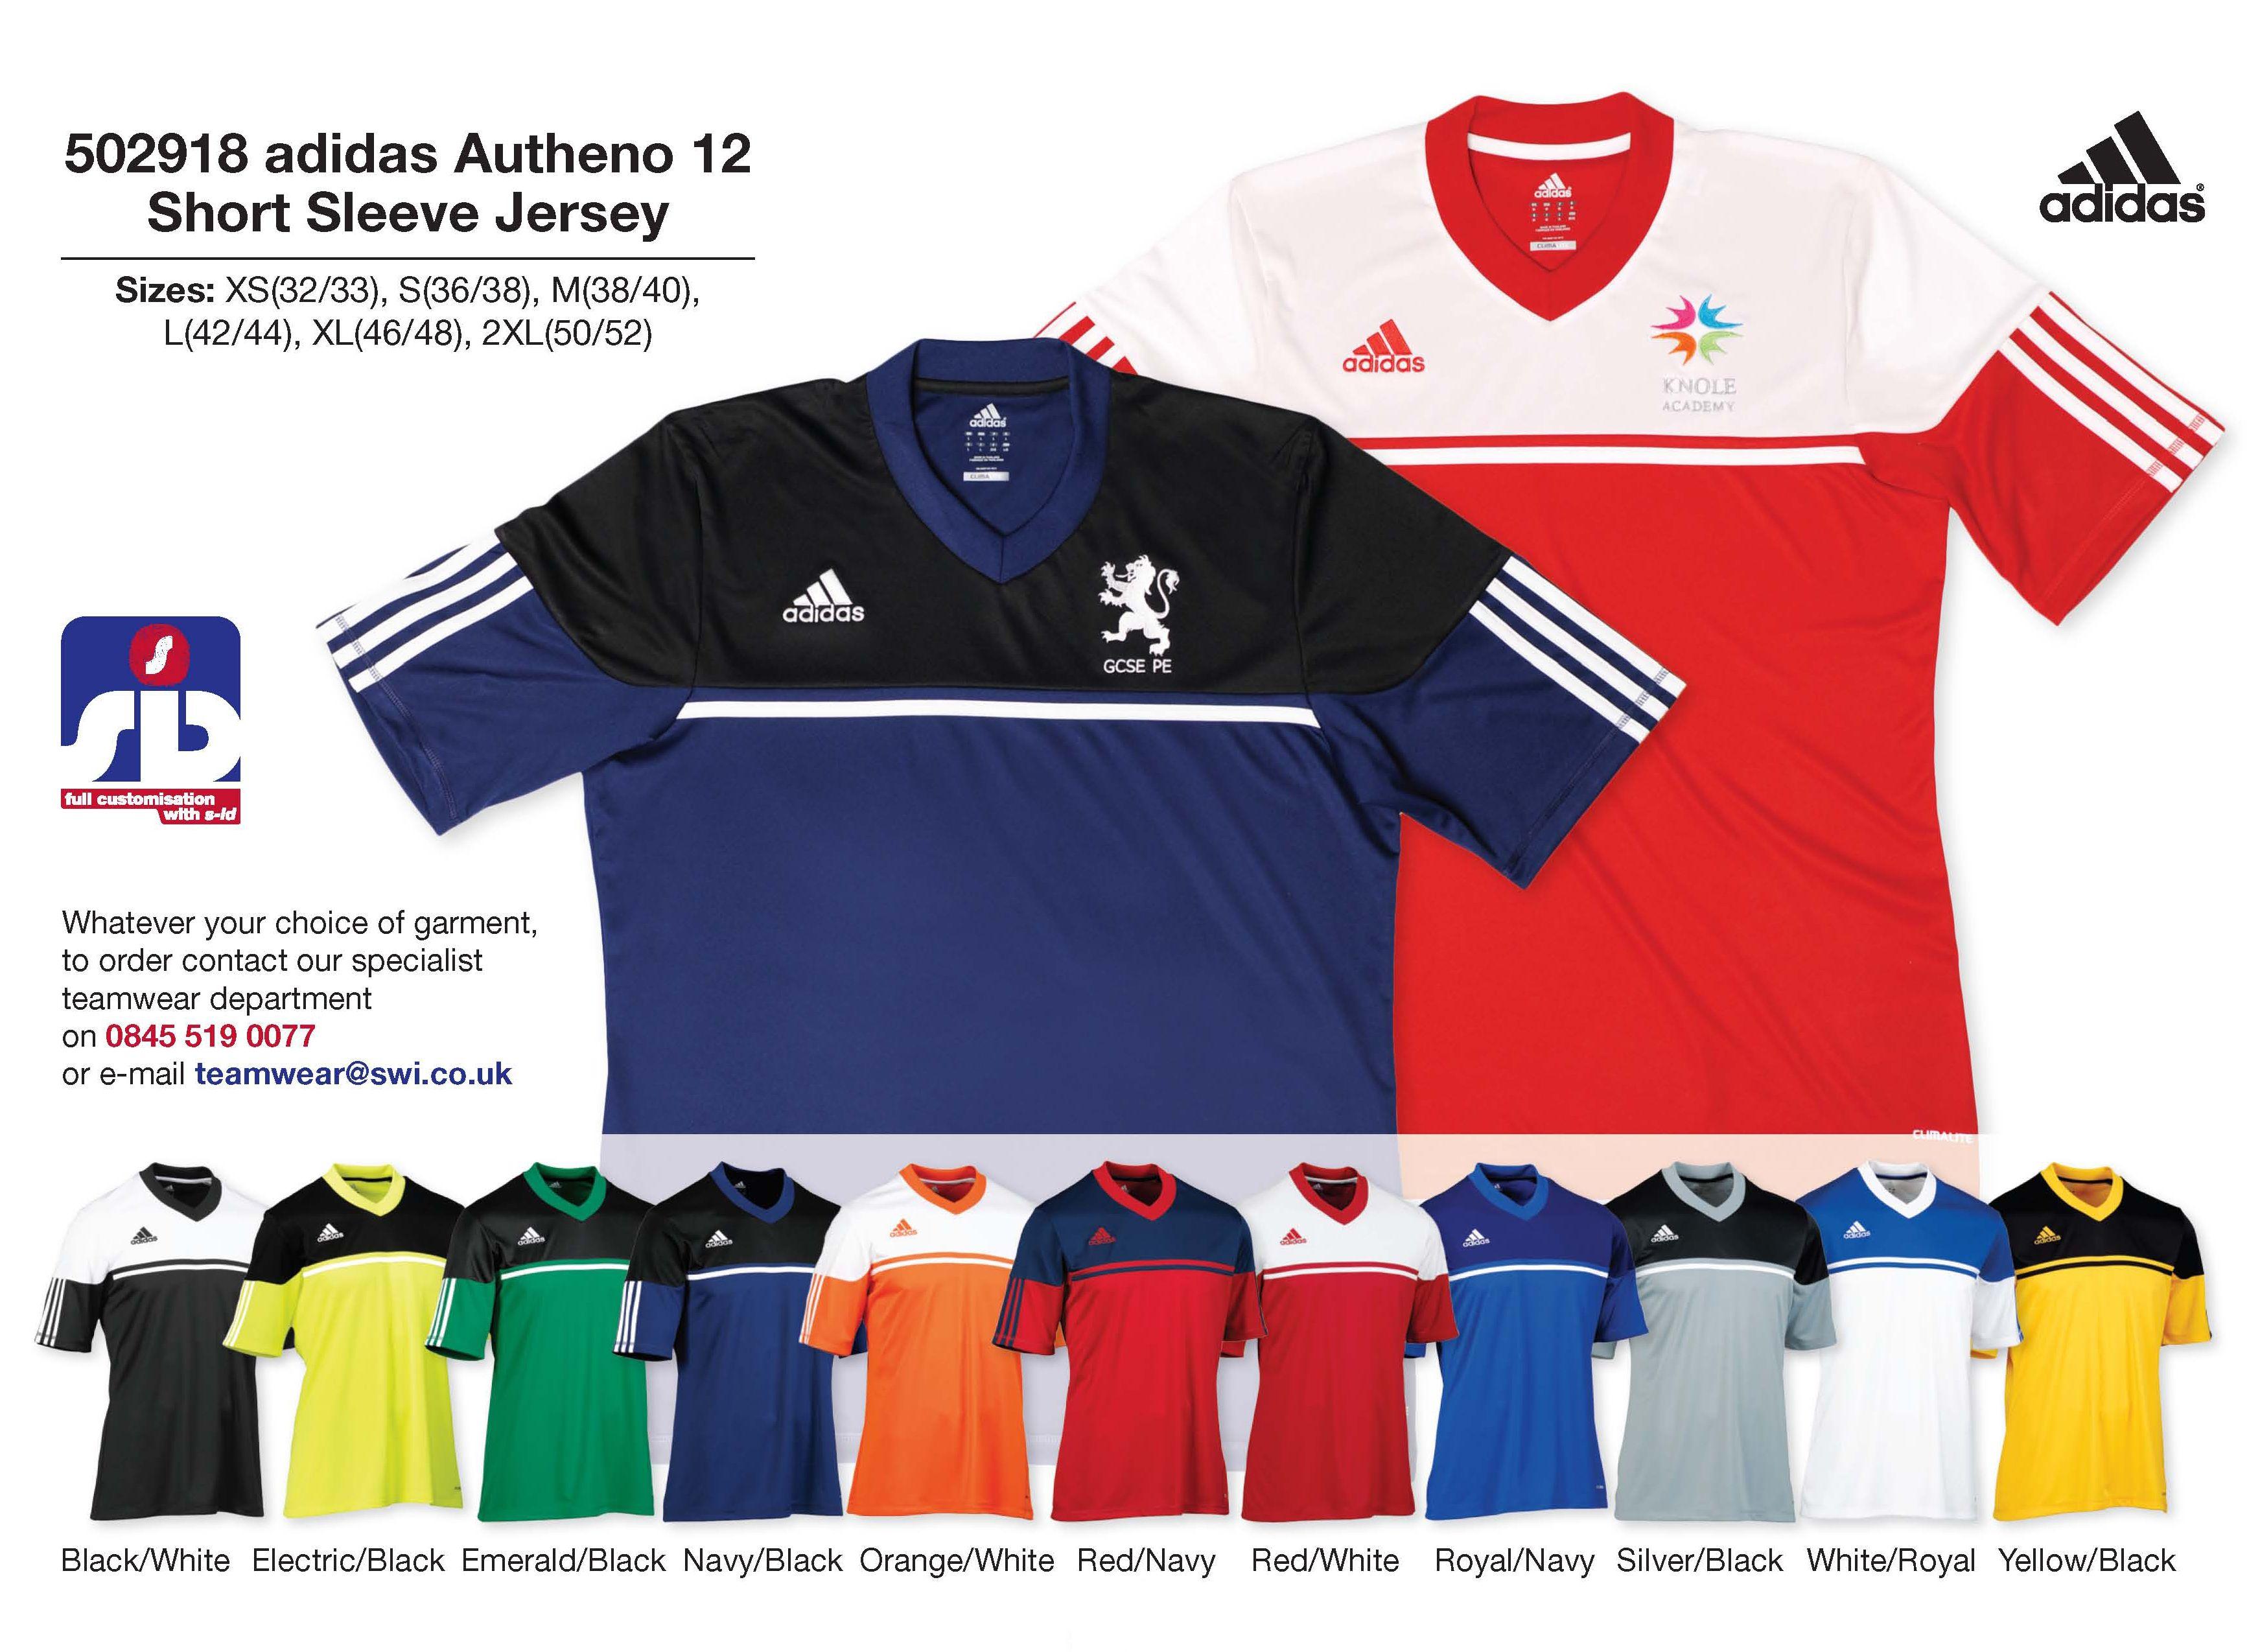 adidas autheno 12 short sleeved jersey adidas teamwear www swi co